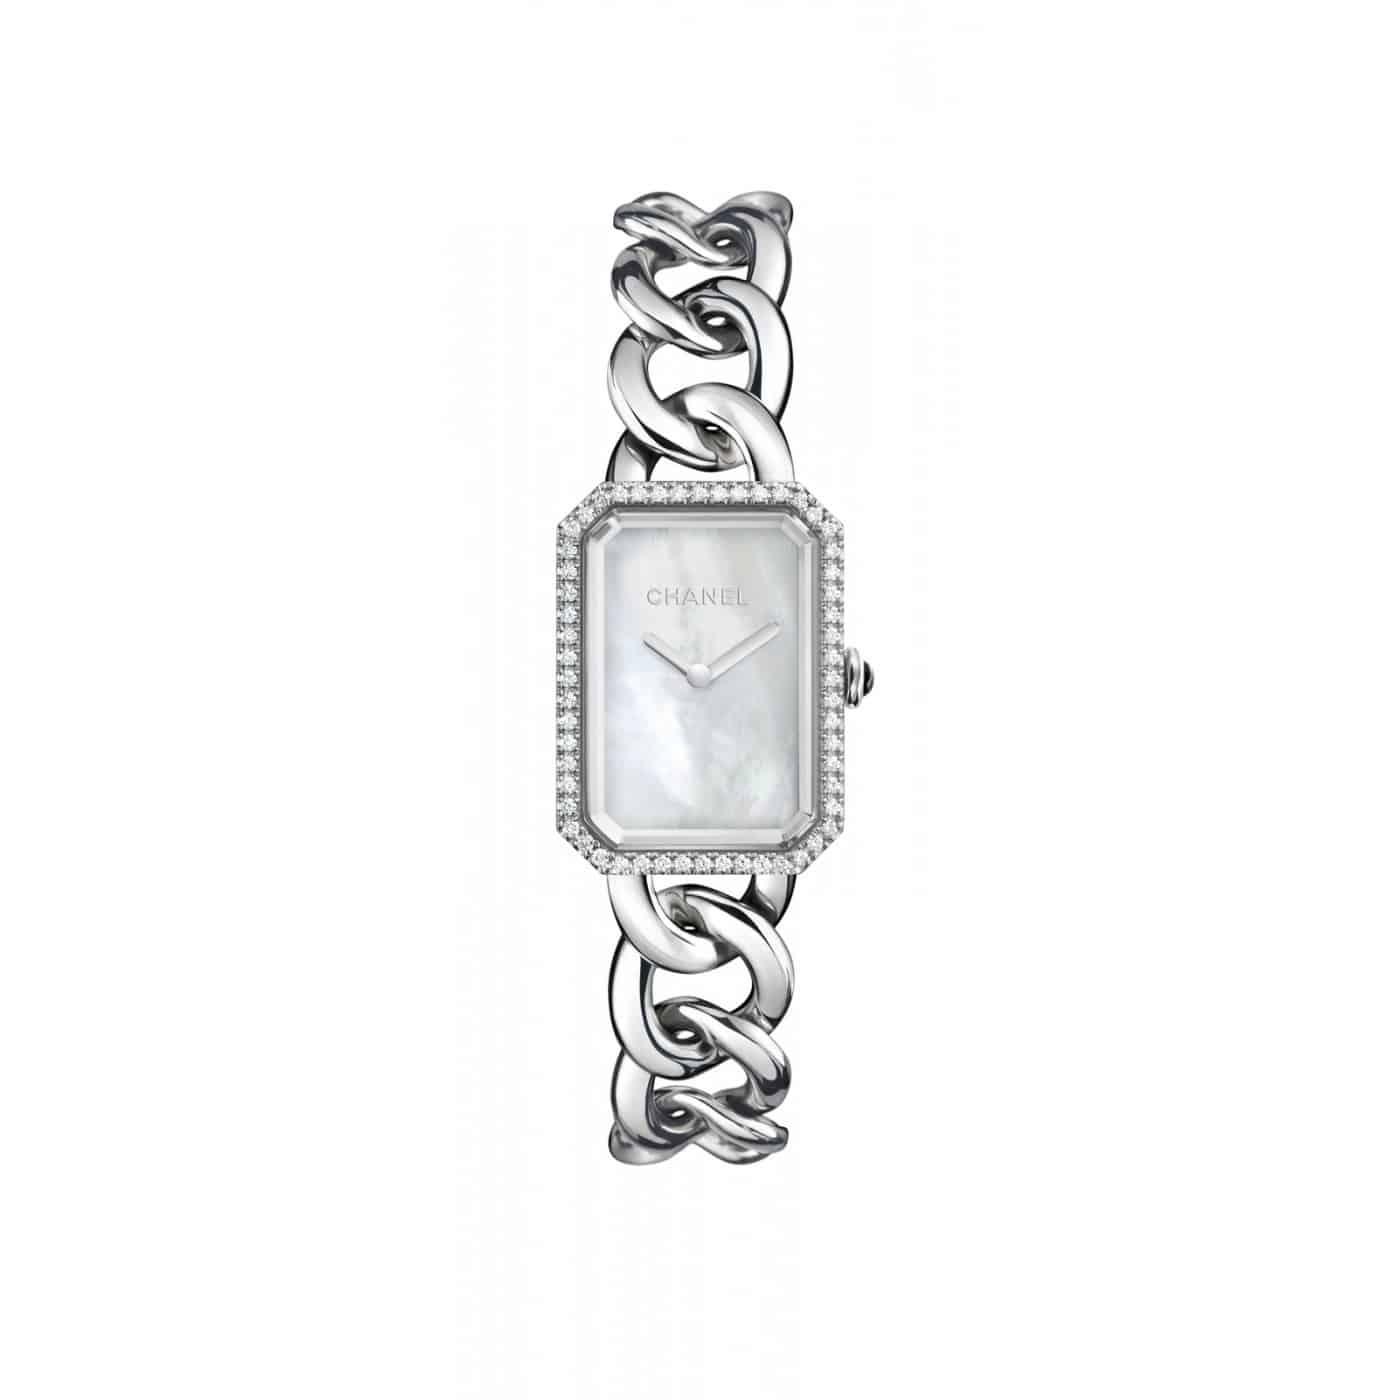 Chanel Chain Diamond Watch